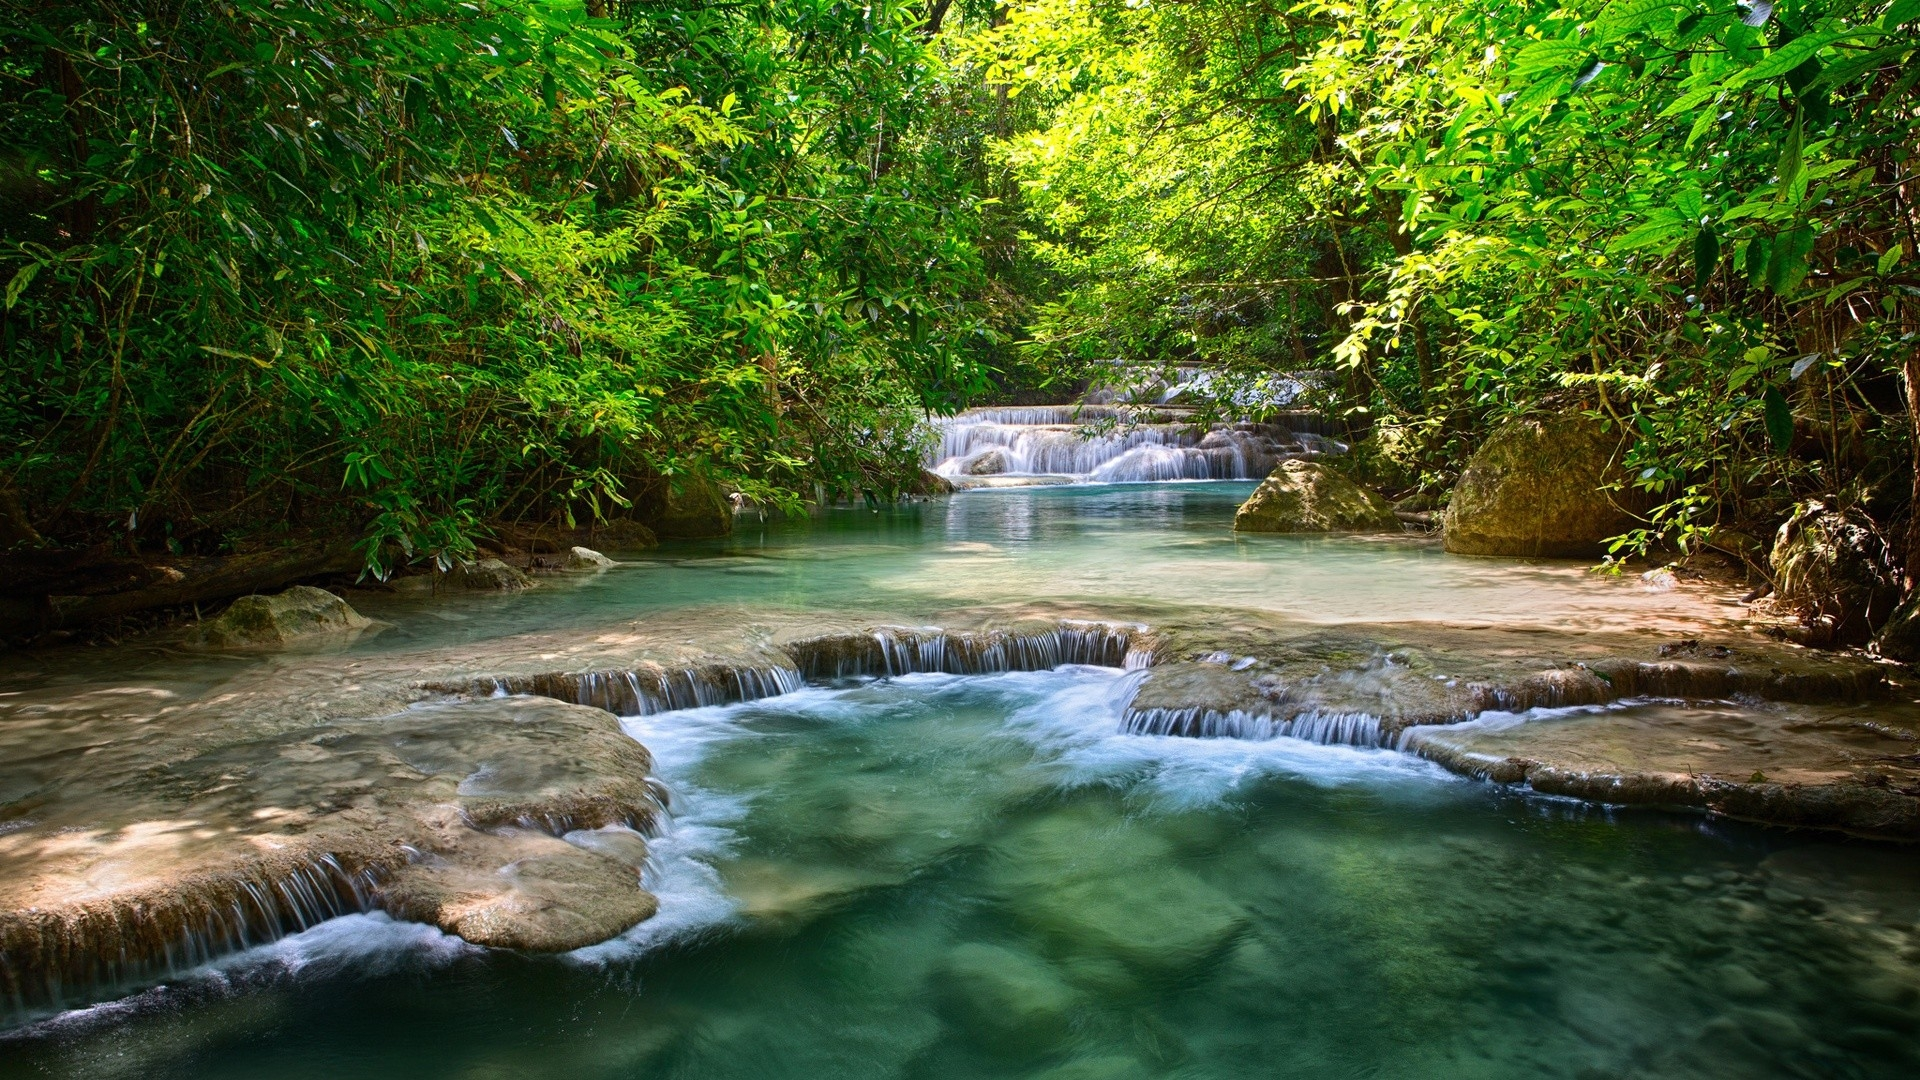 river with small rapids HD Desktop Wallpaper HD Desktop Wallpaper 1920x1080